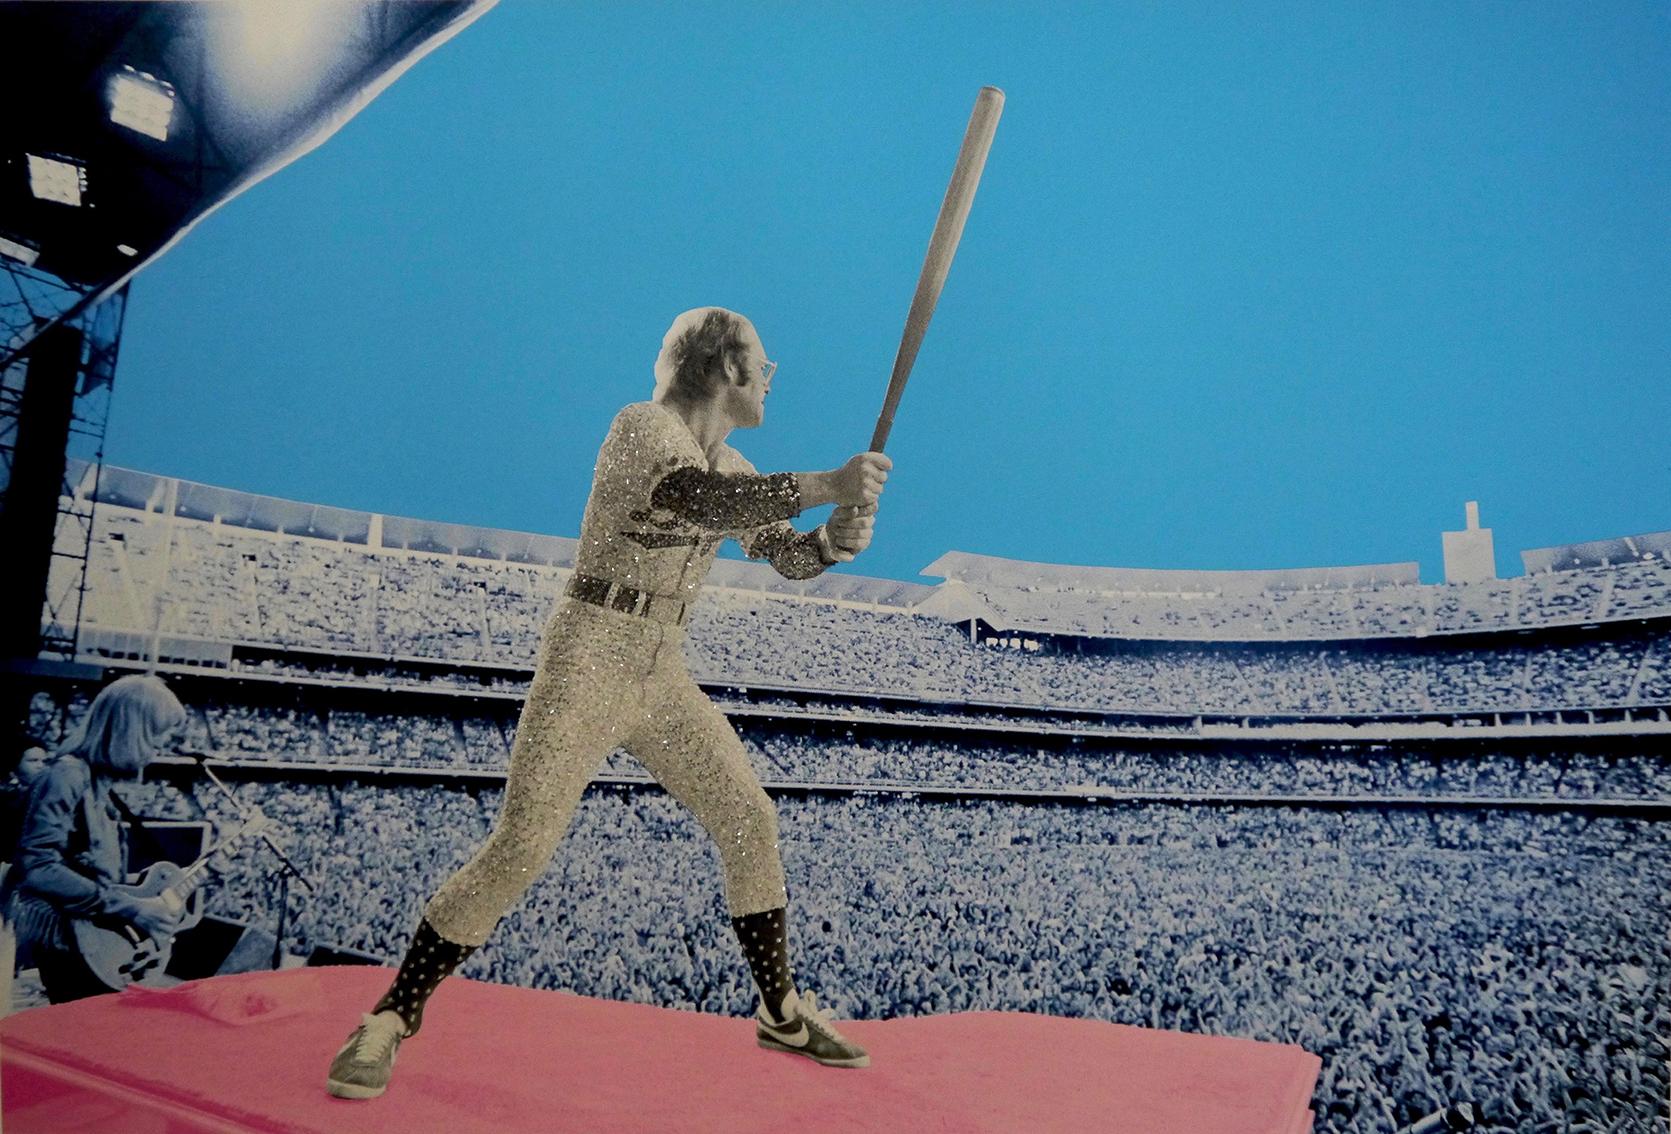 Elton John : Home Run - Dodger Stadium 1975